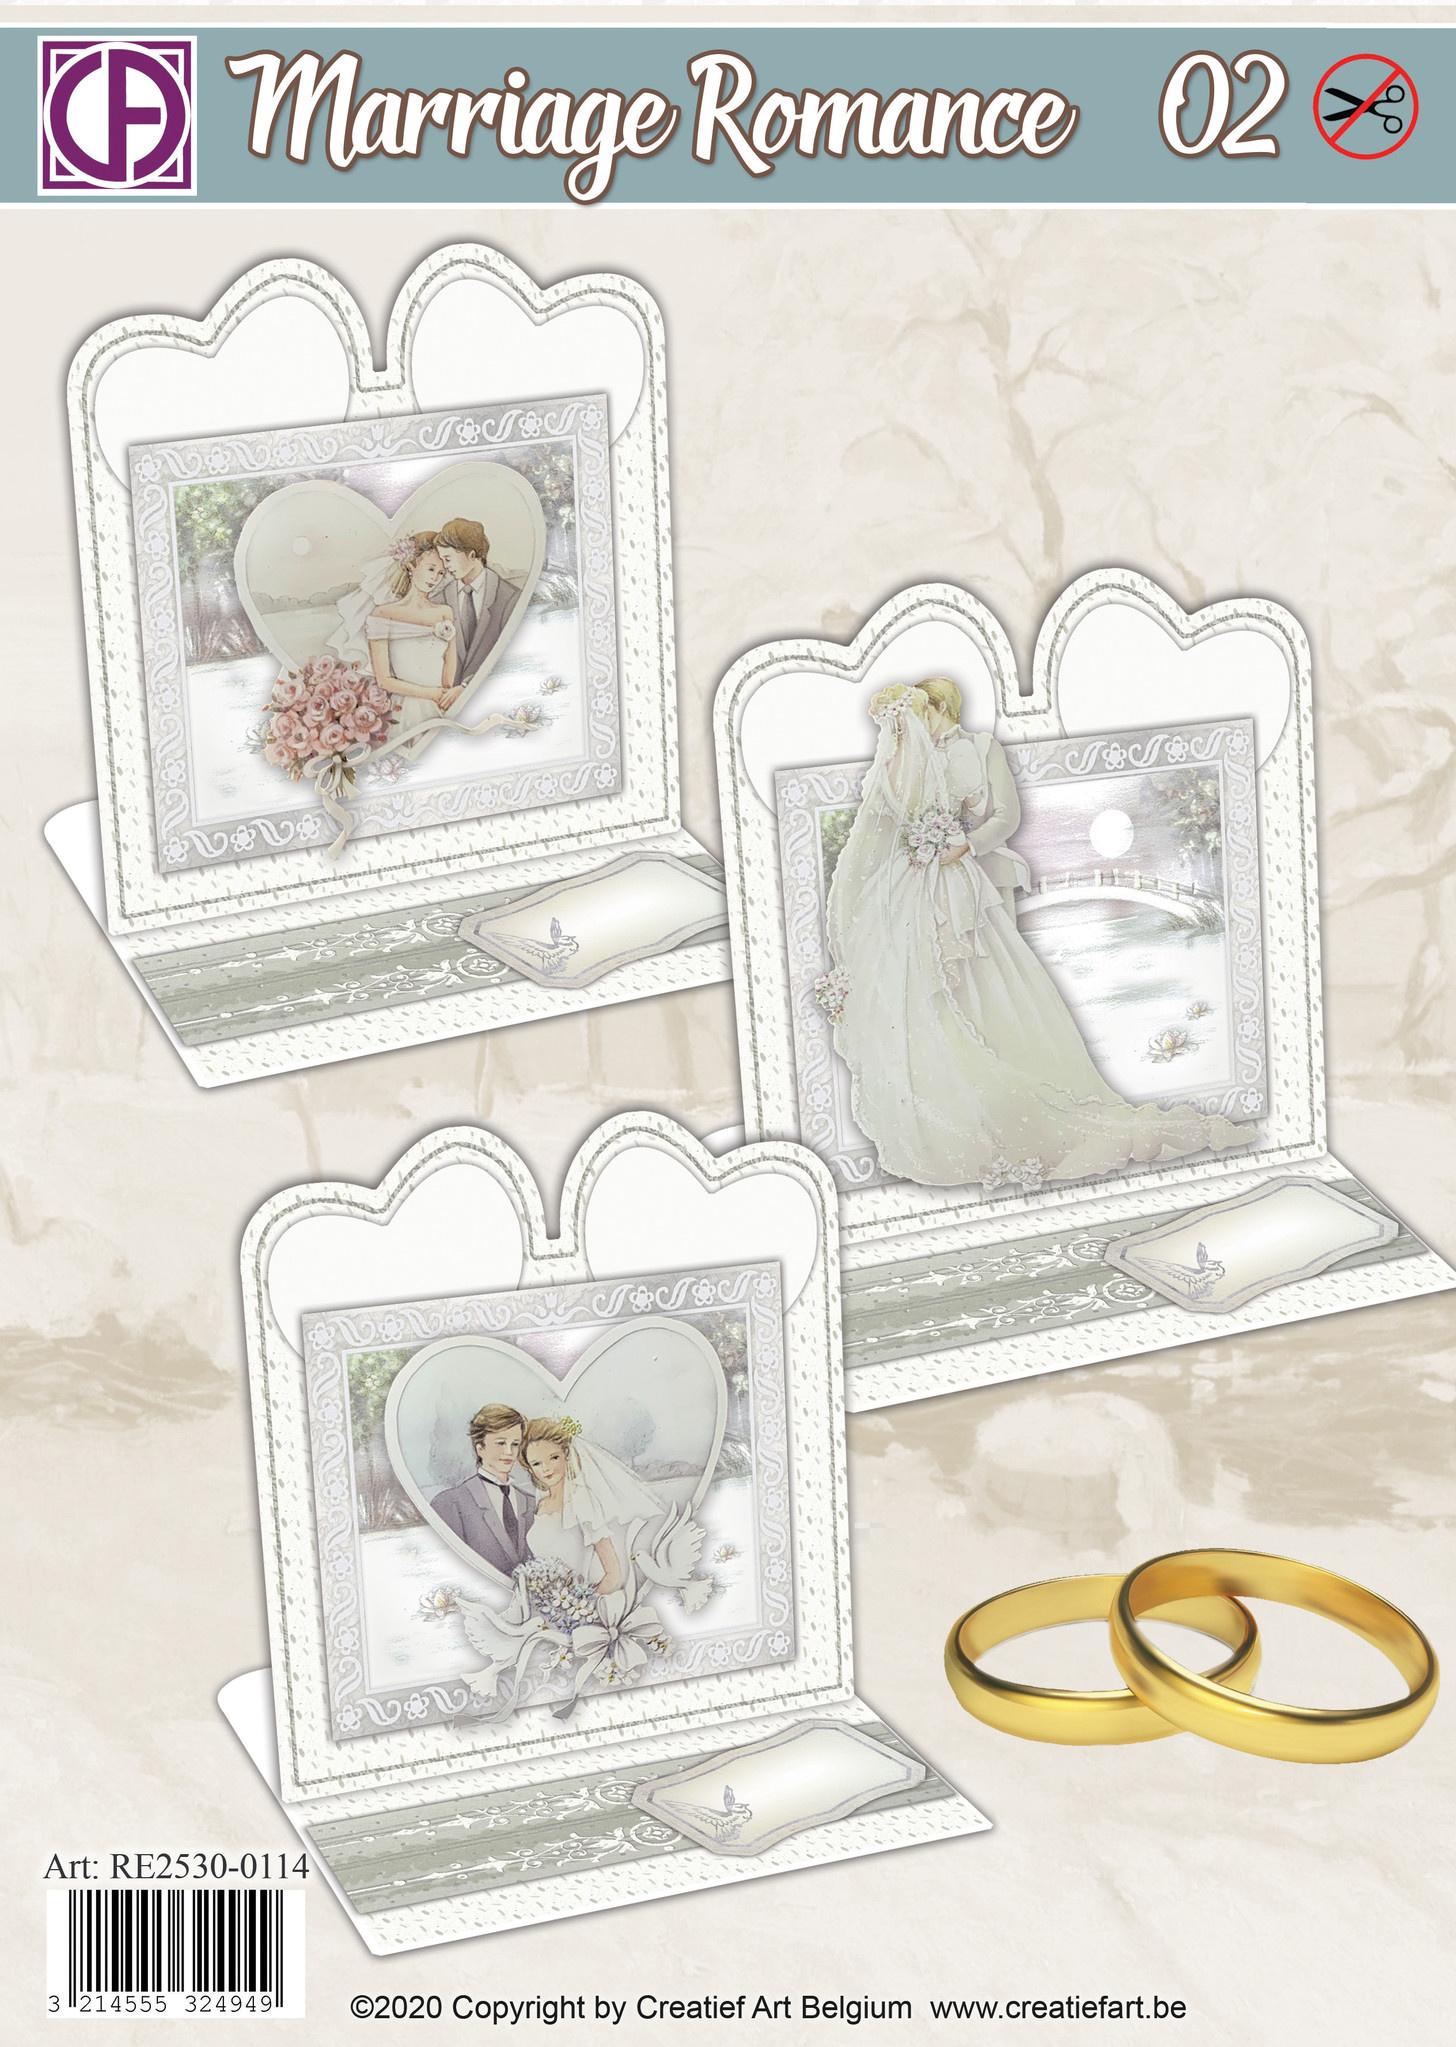 Creatief Art Marriage Romance 02